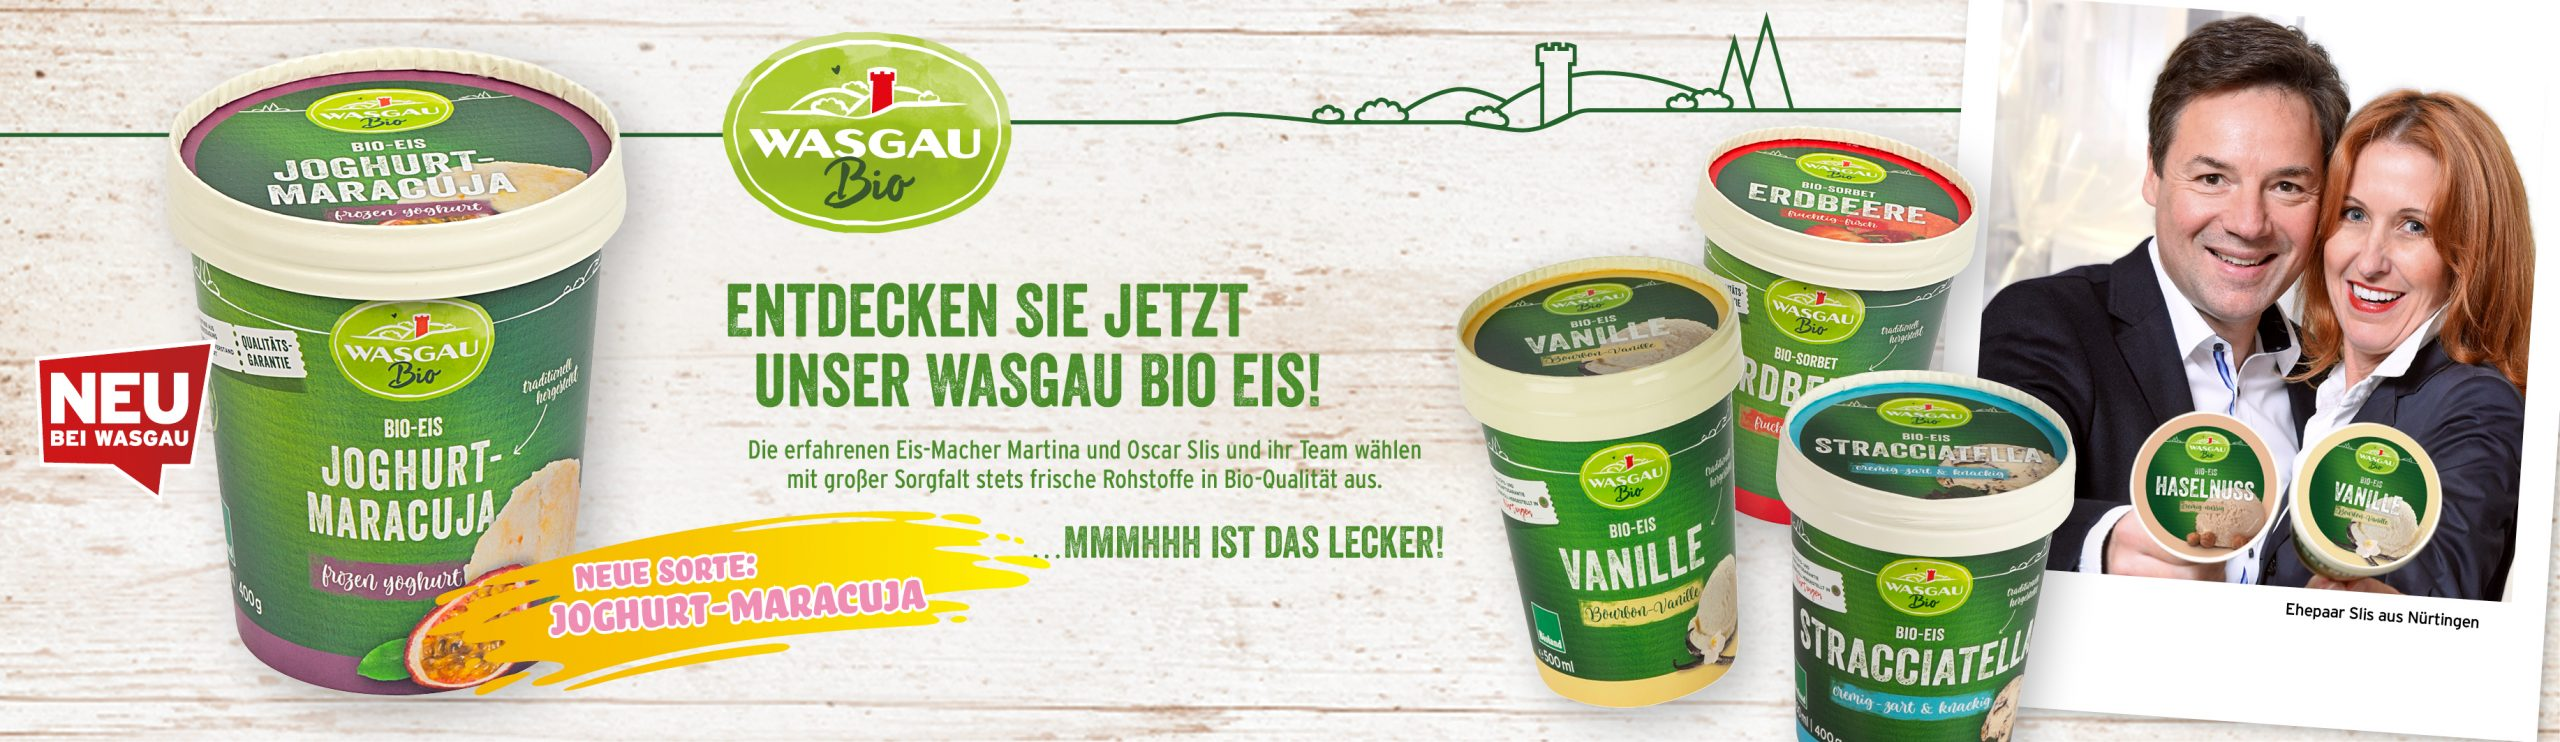 Neu: Das WASGAU Bio Eis Joghurt-Maracuja